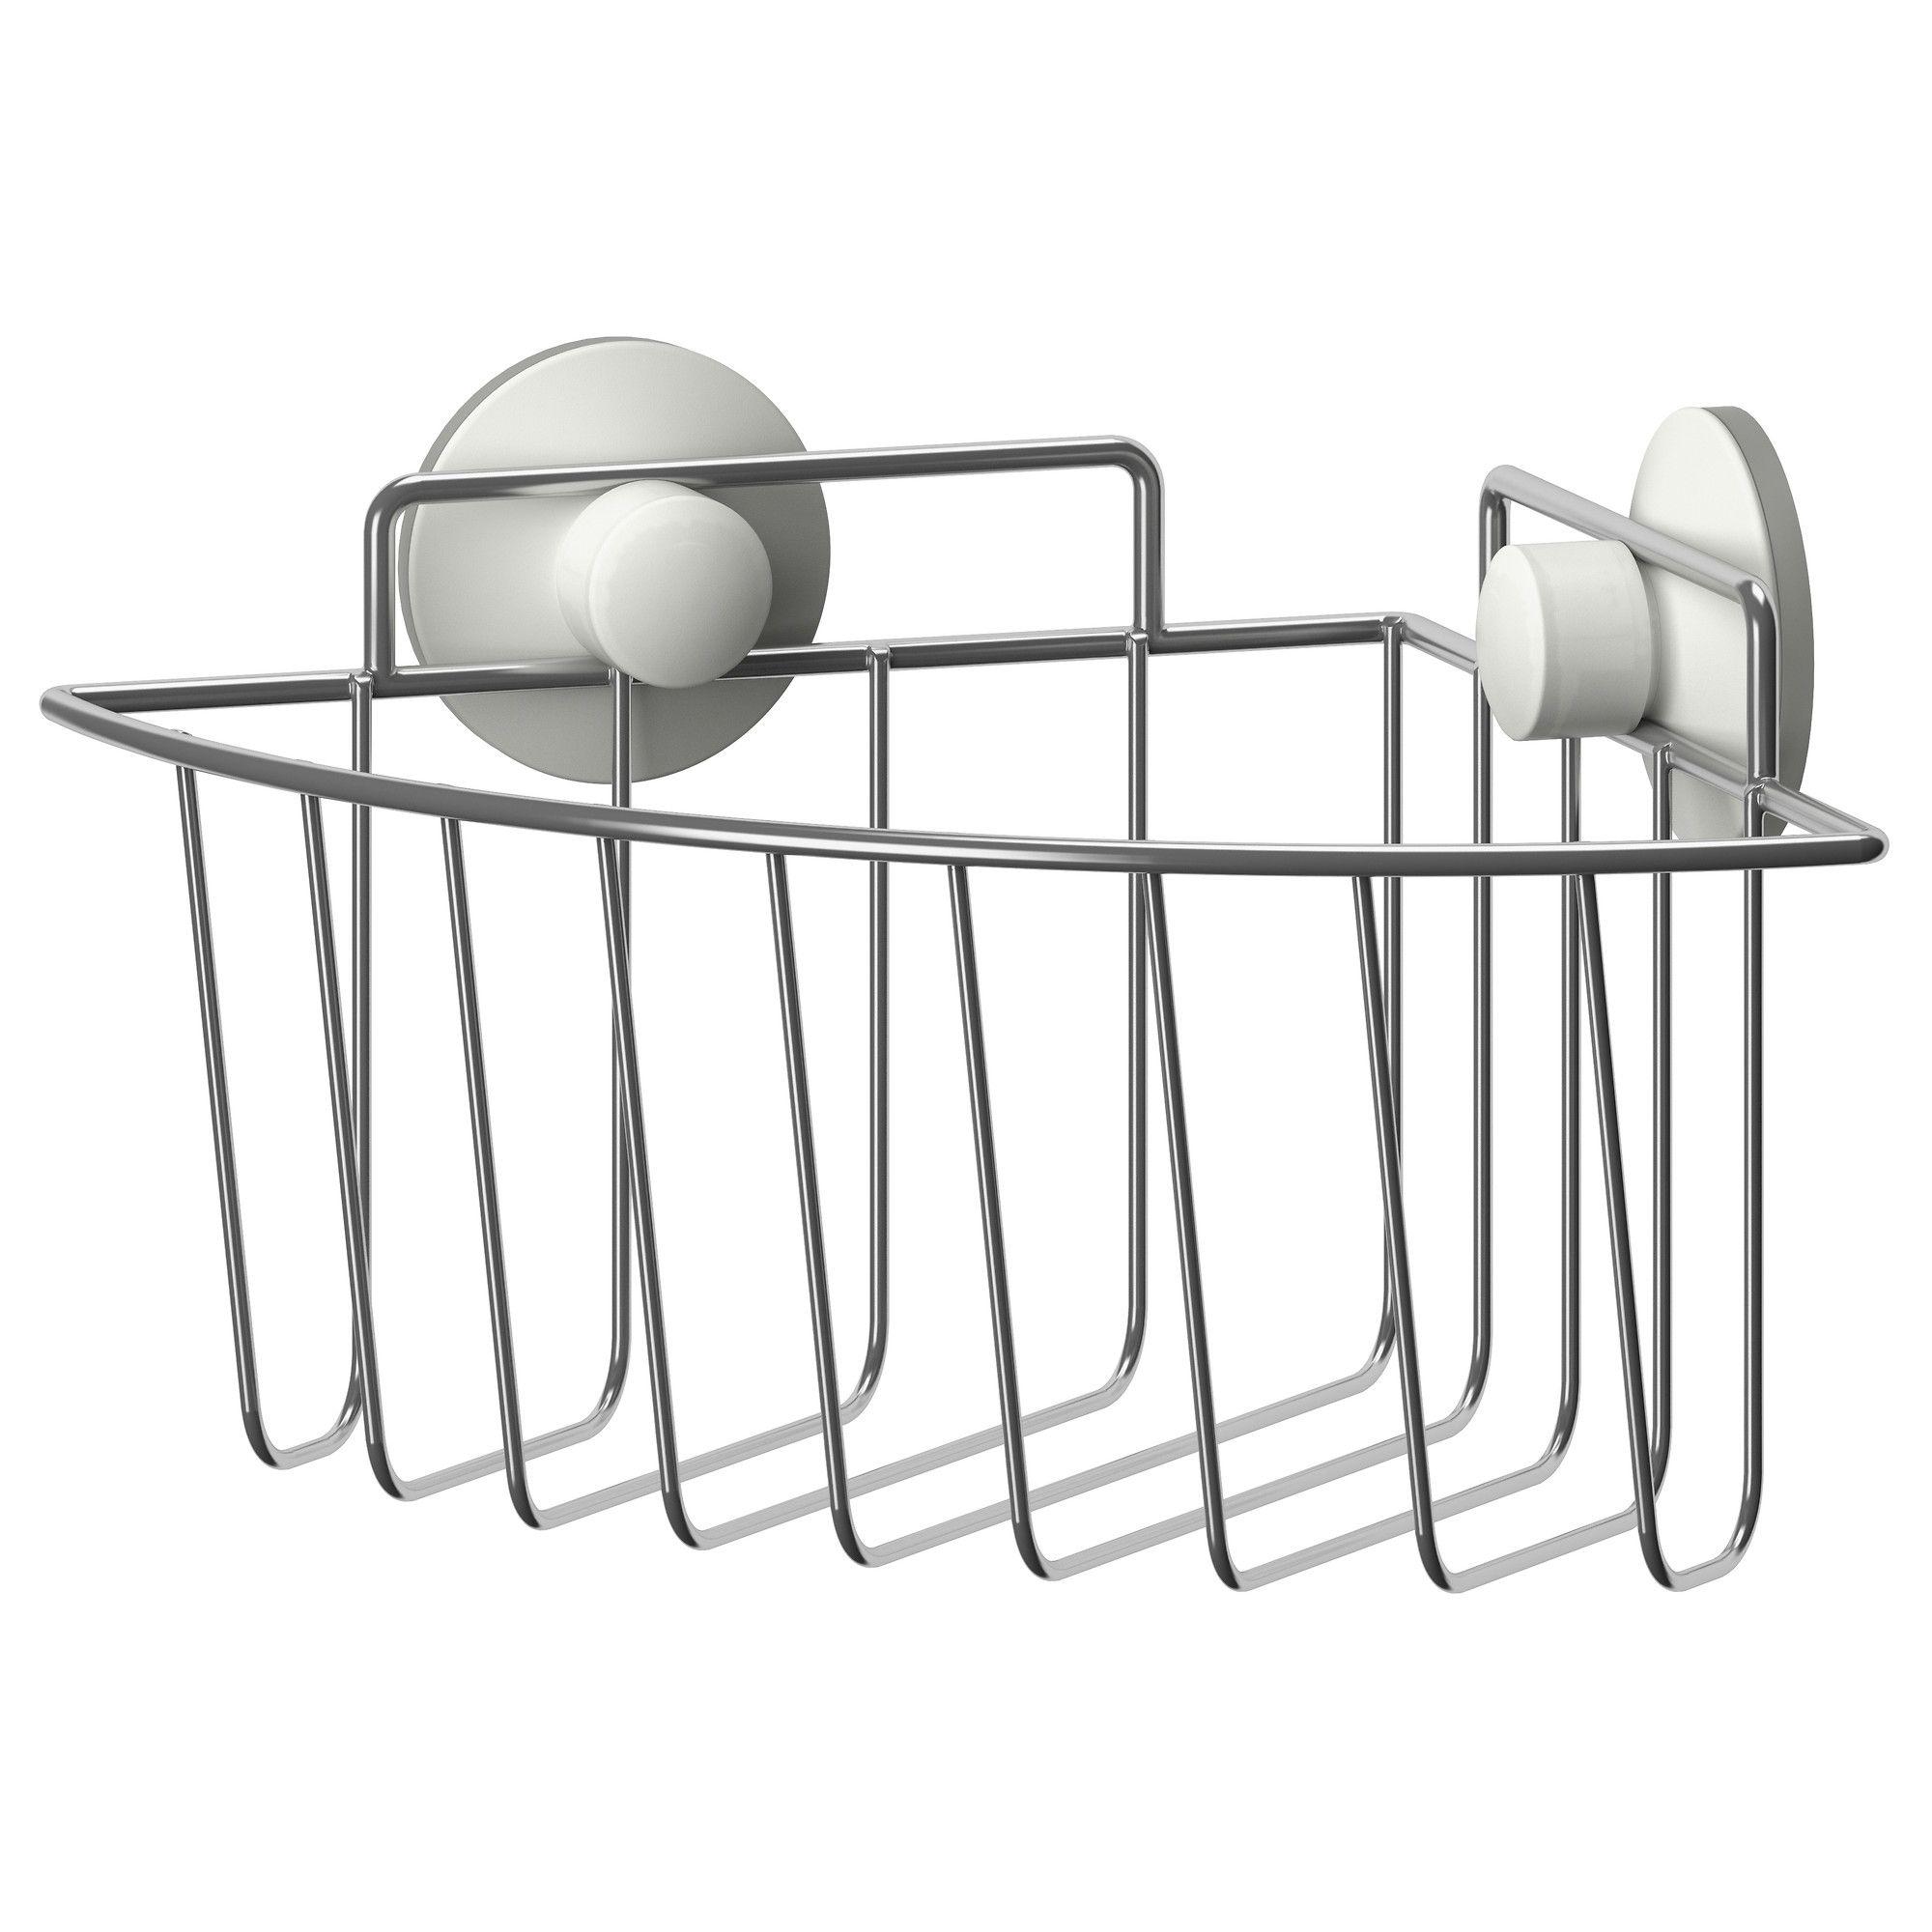 IMMELN Corner shower basket IKEA Ikea bathroom